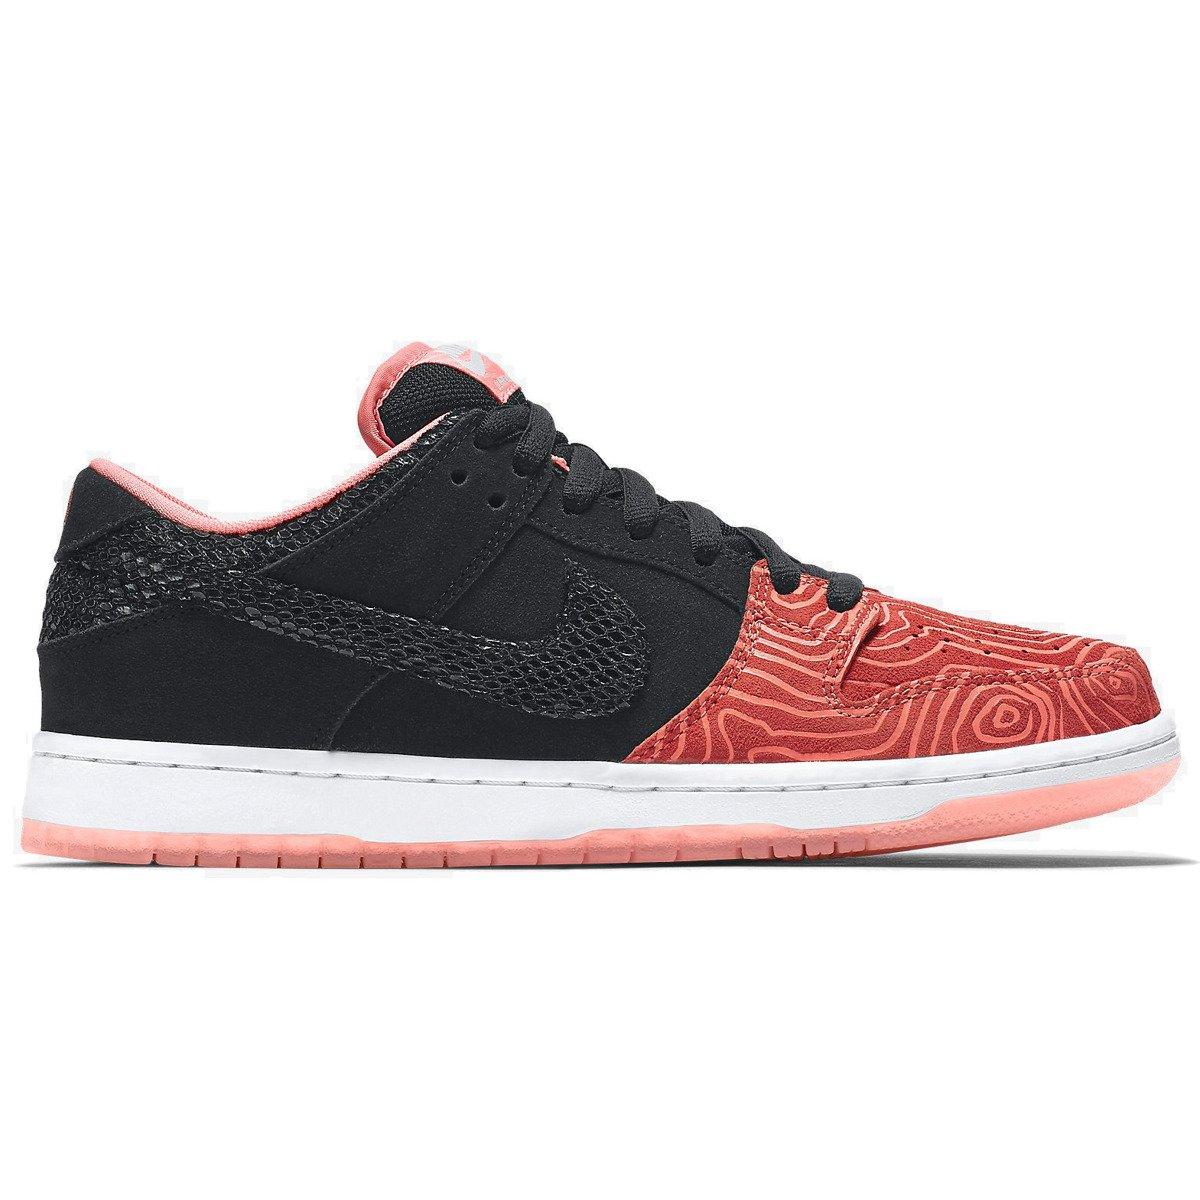 differently 31a90 7a0f3 Miniramp Skateshop buty nike sb dunk low pro atomic pinkblac